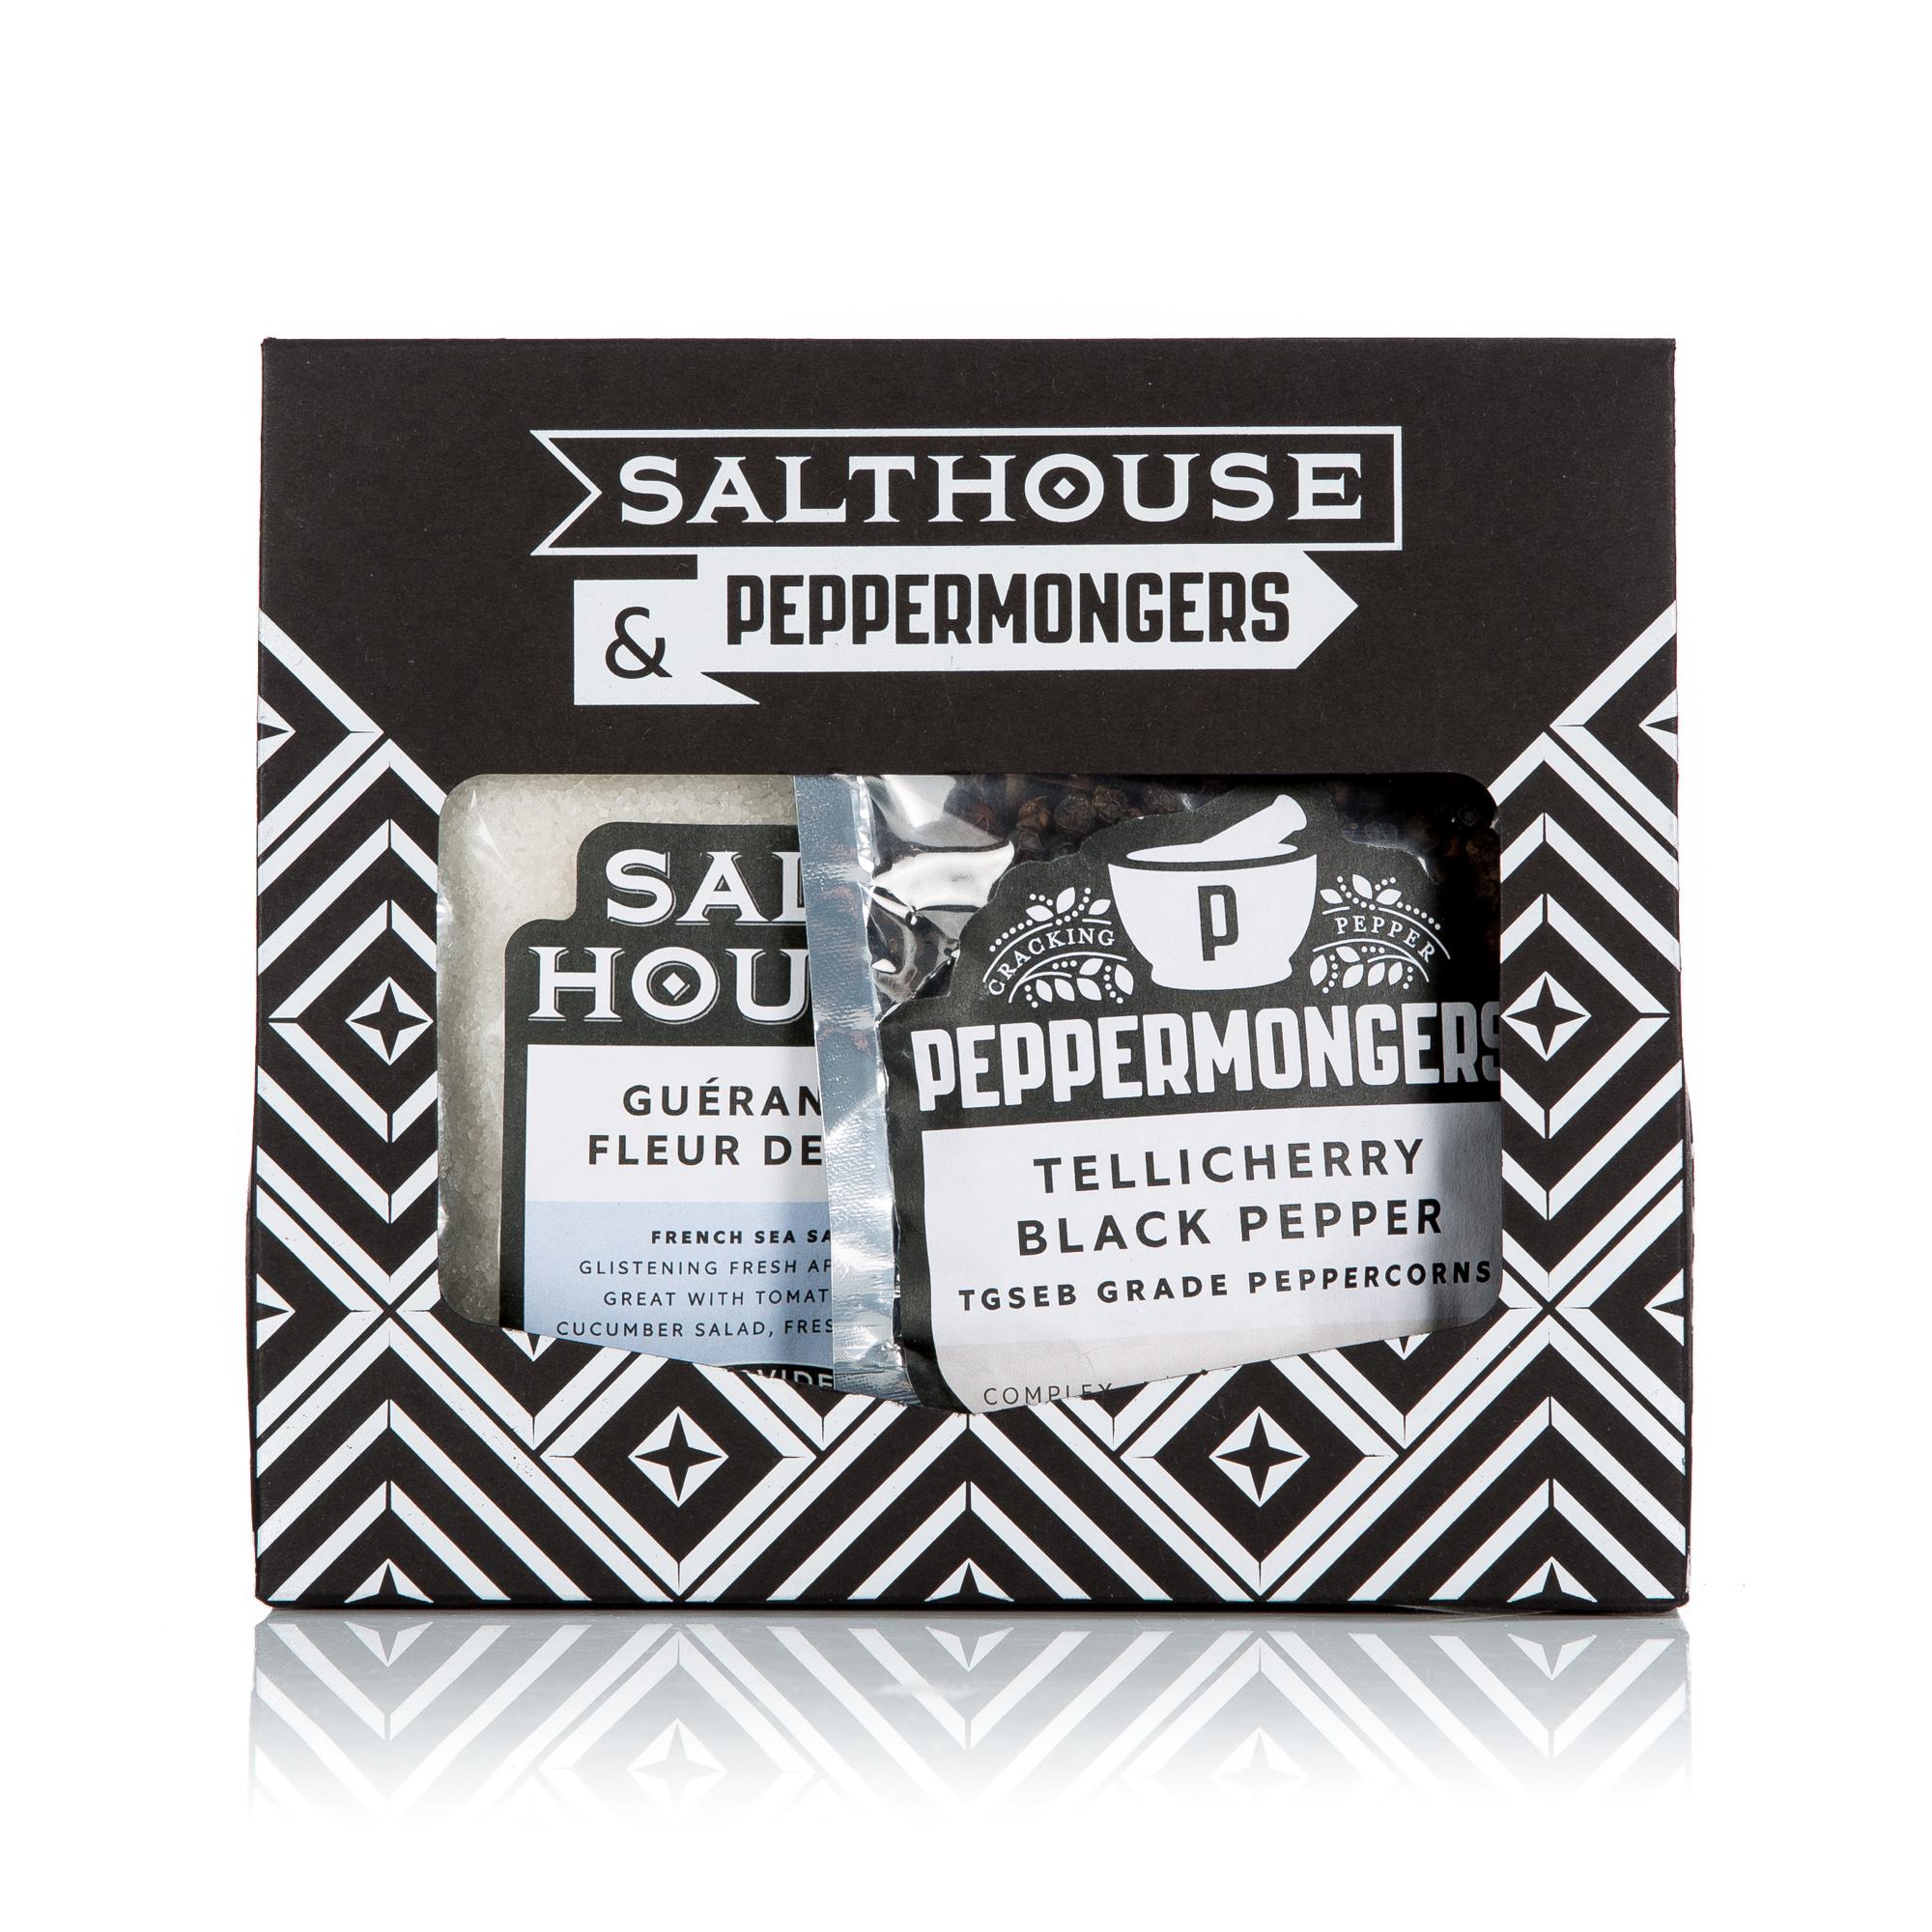 Fleur de Sel & Tellicherry Black Pepper Gift Set